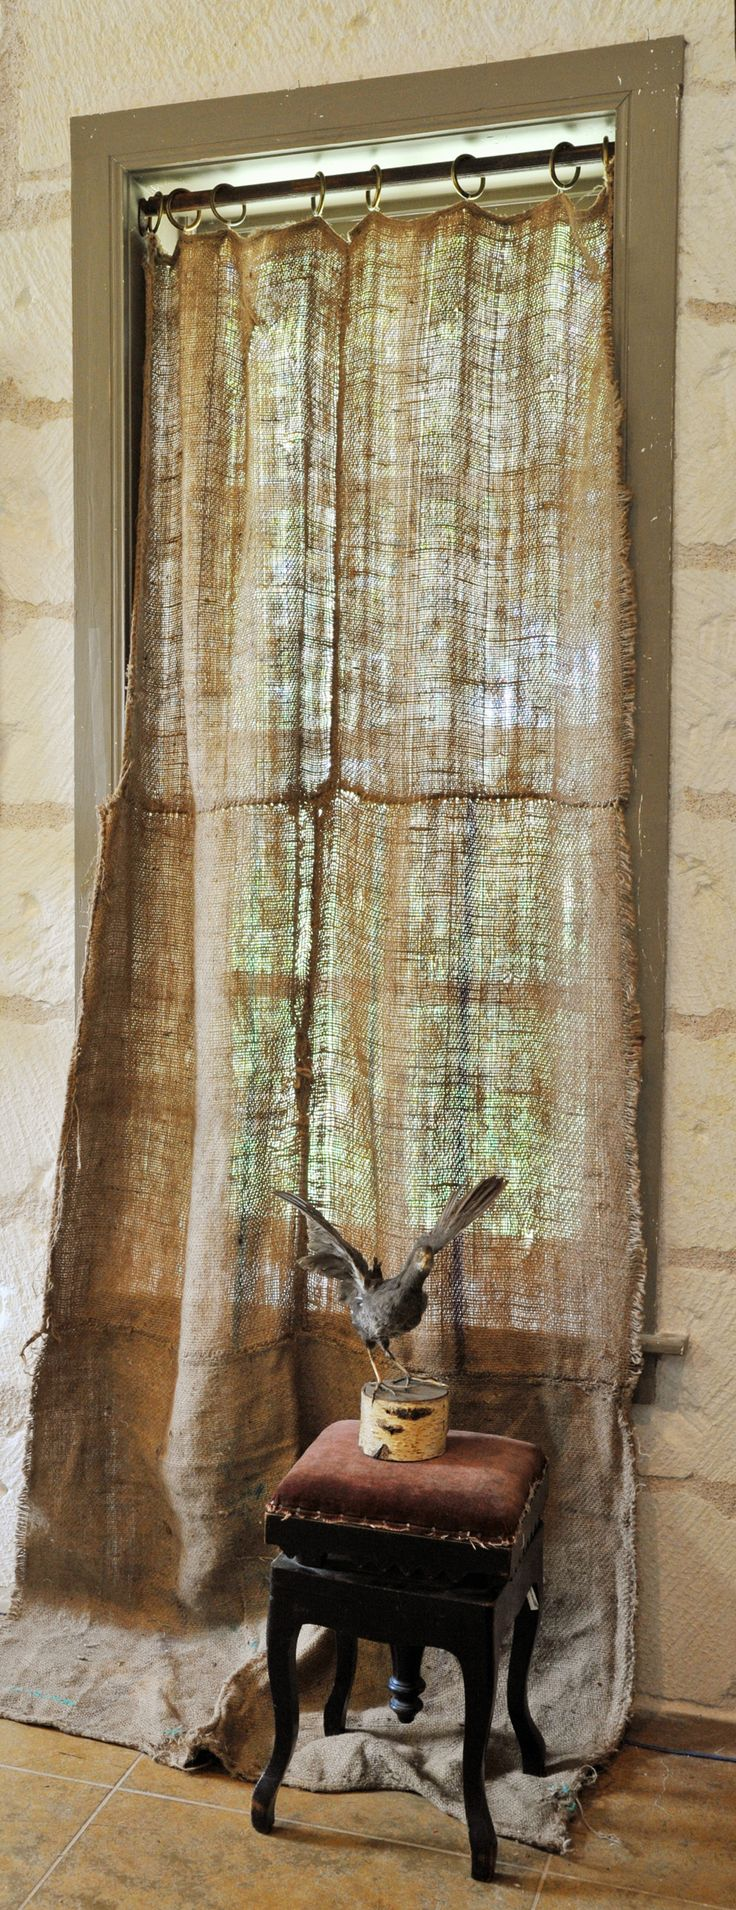 Rustic burlap window treatments - Best 25 Rustic Window Treatments Ideas On Pinterest Rustic Interior Shutters Rustic Windows And Rustic Living Room Curtains Ideas